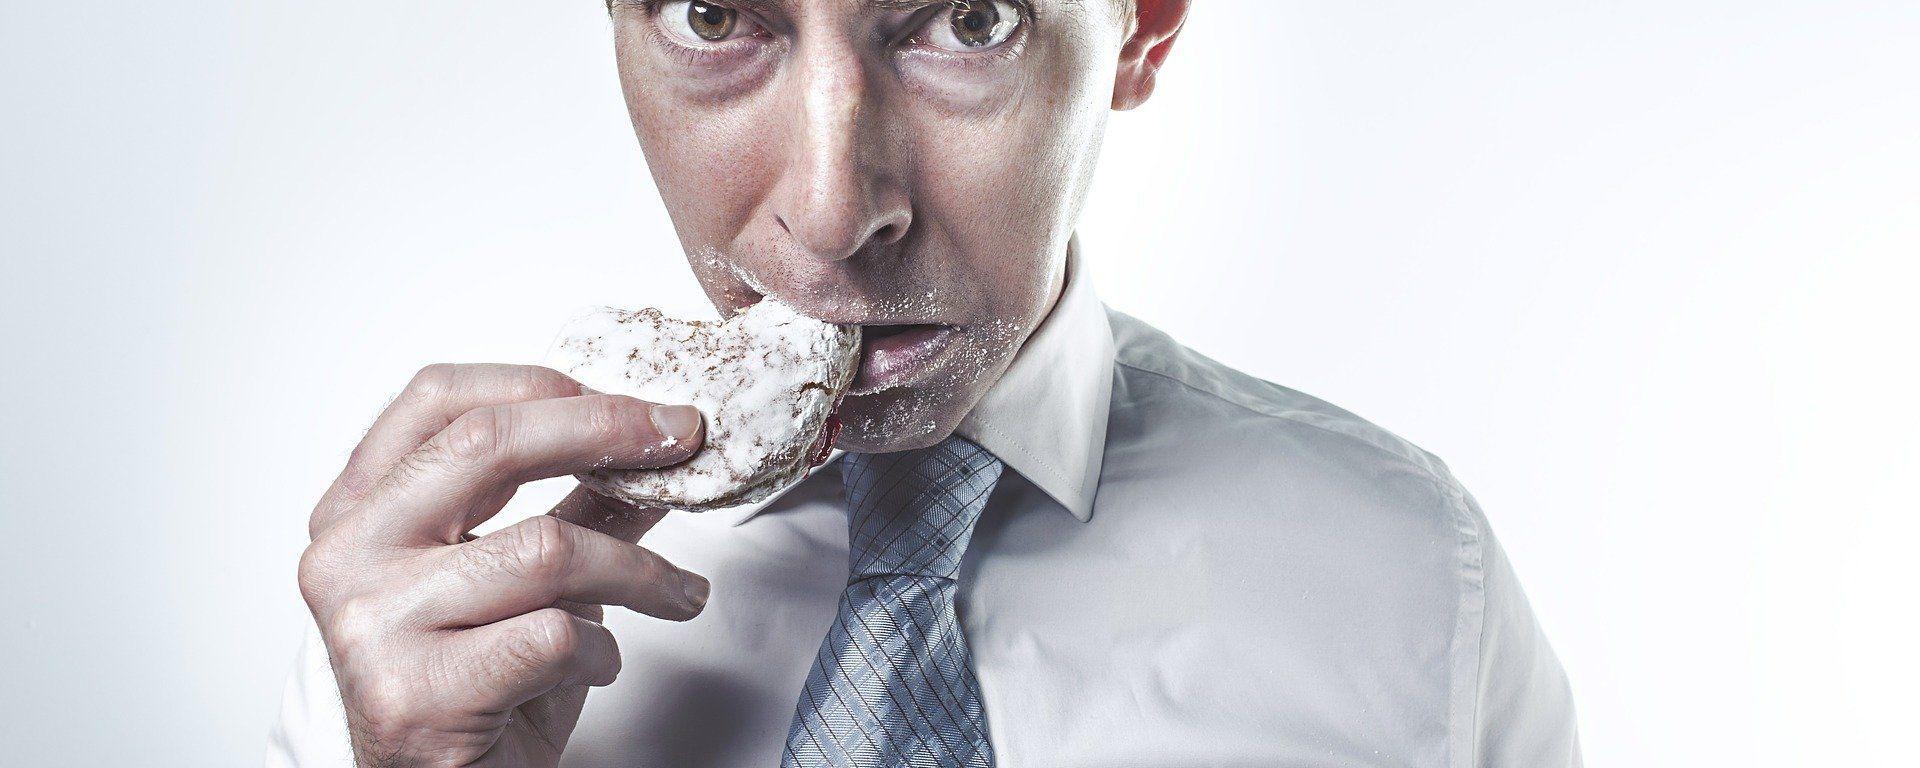 Uomo che mangia - Sputnik Italia, 1920, 25.07.2021